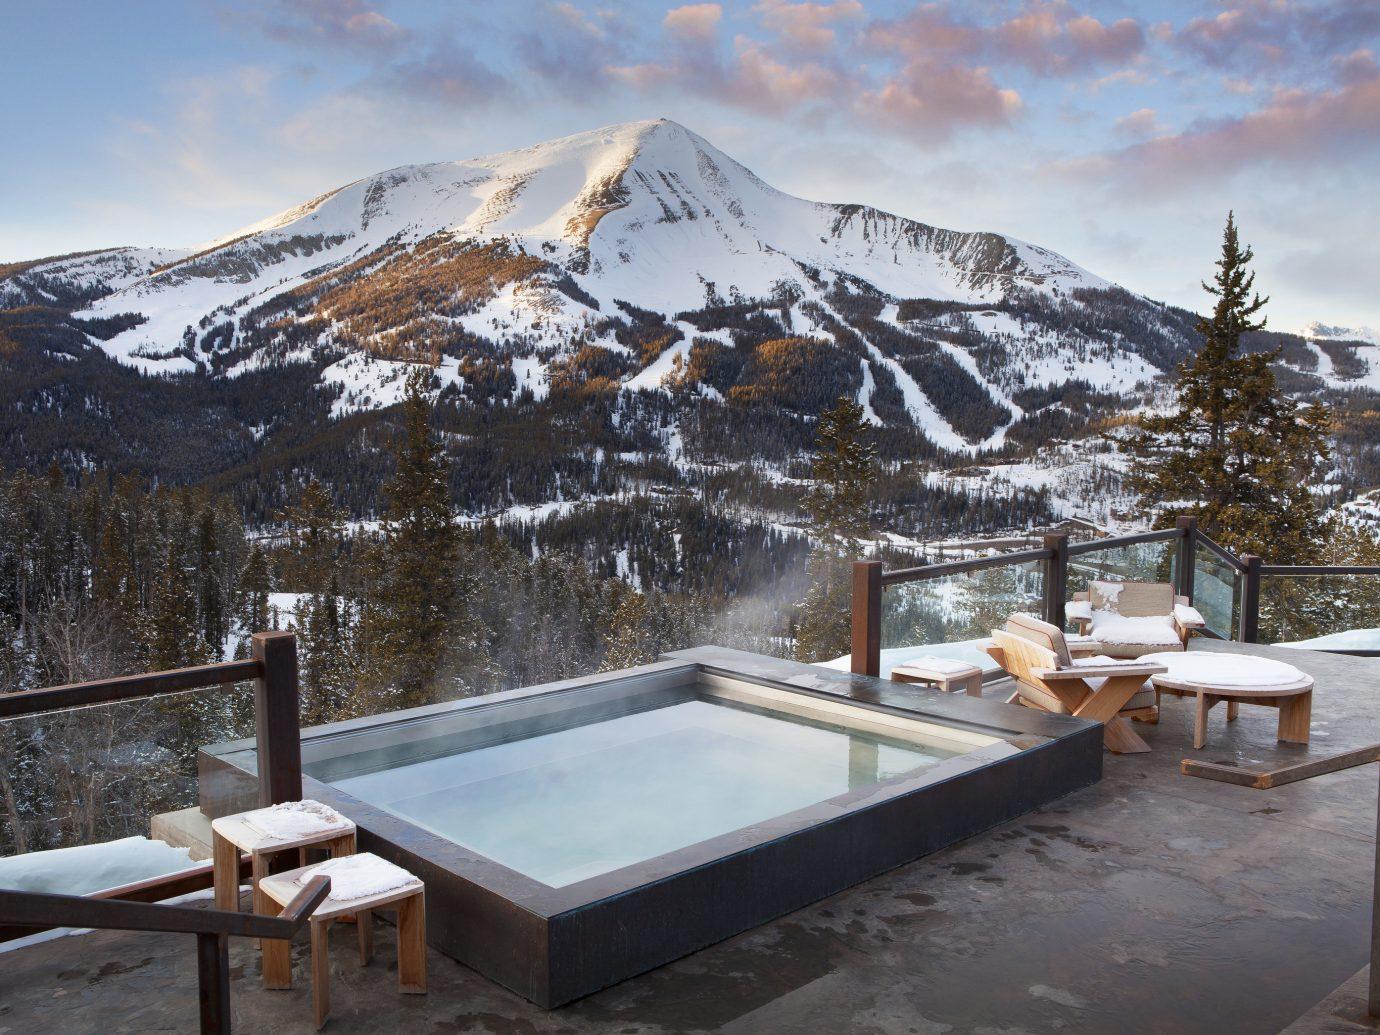 Beauty Hotels Luxury Travel Mountains + Skiing sky outdoor snow Winter weather mountain season Resort mountain range